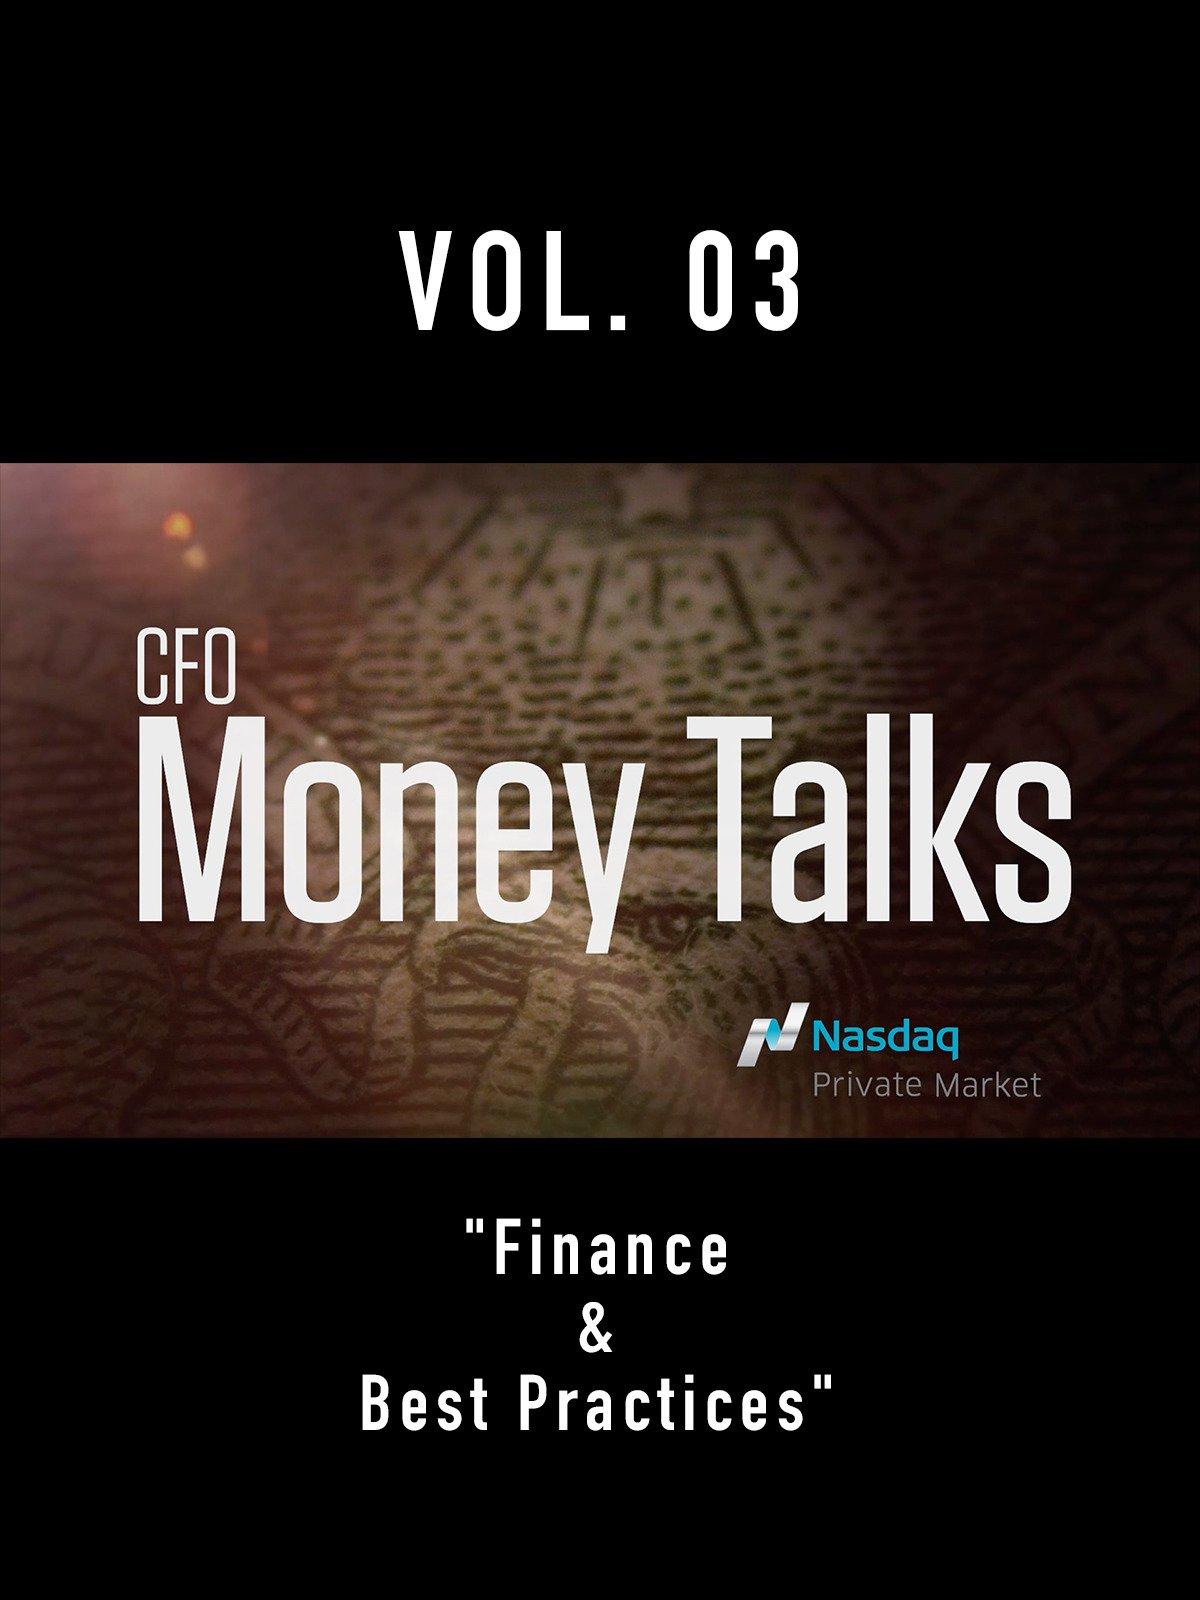 CFO Money Talks Vol. 03